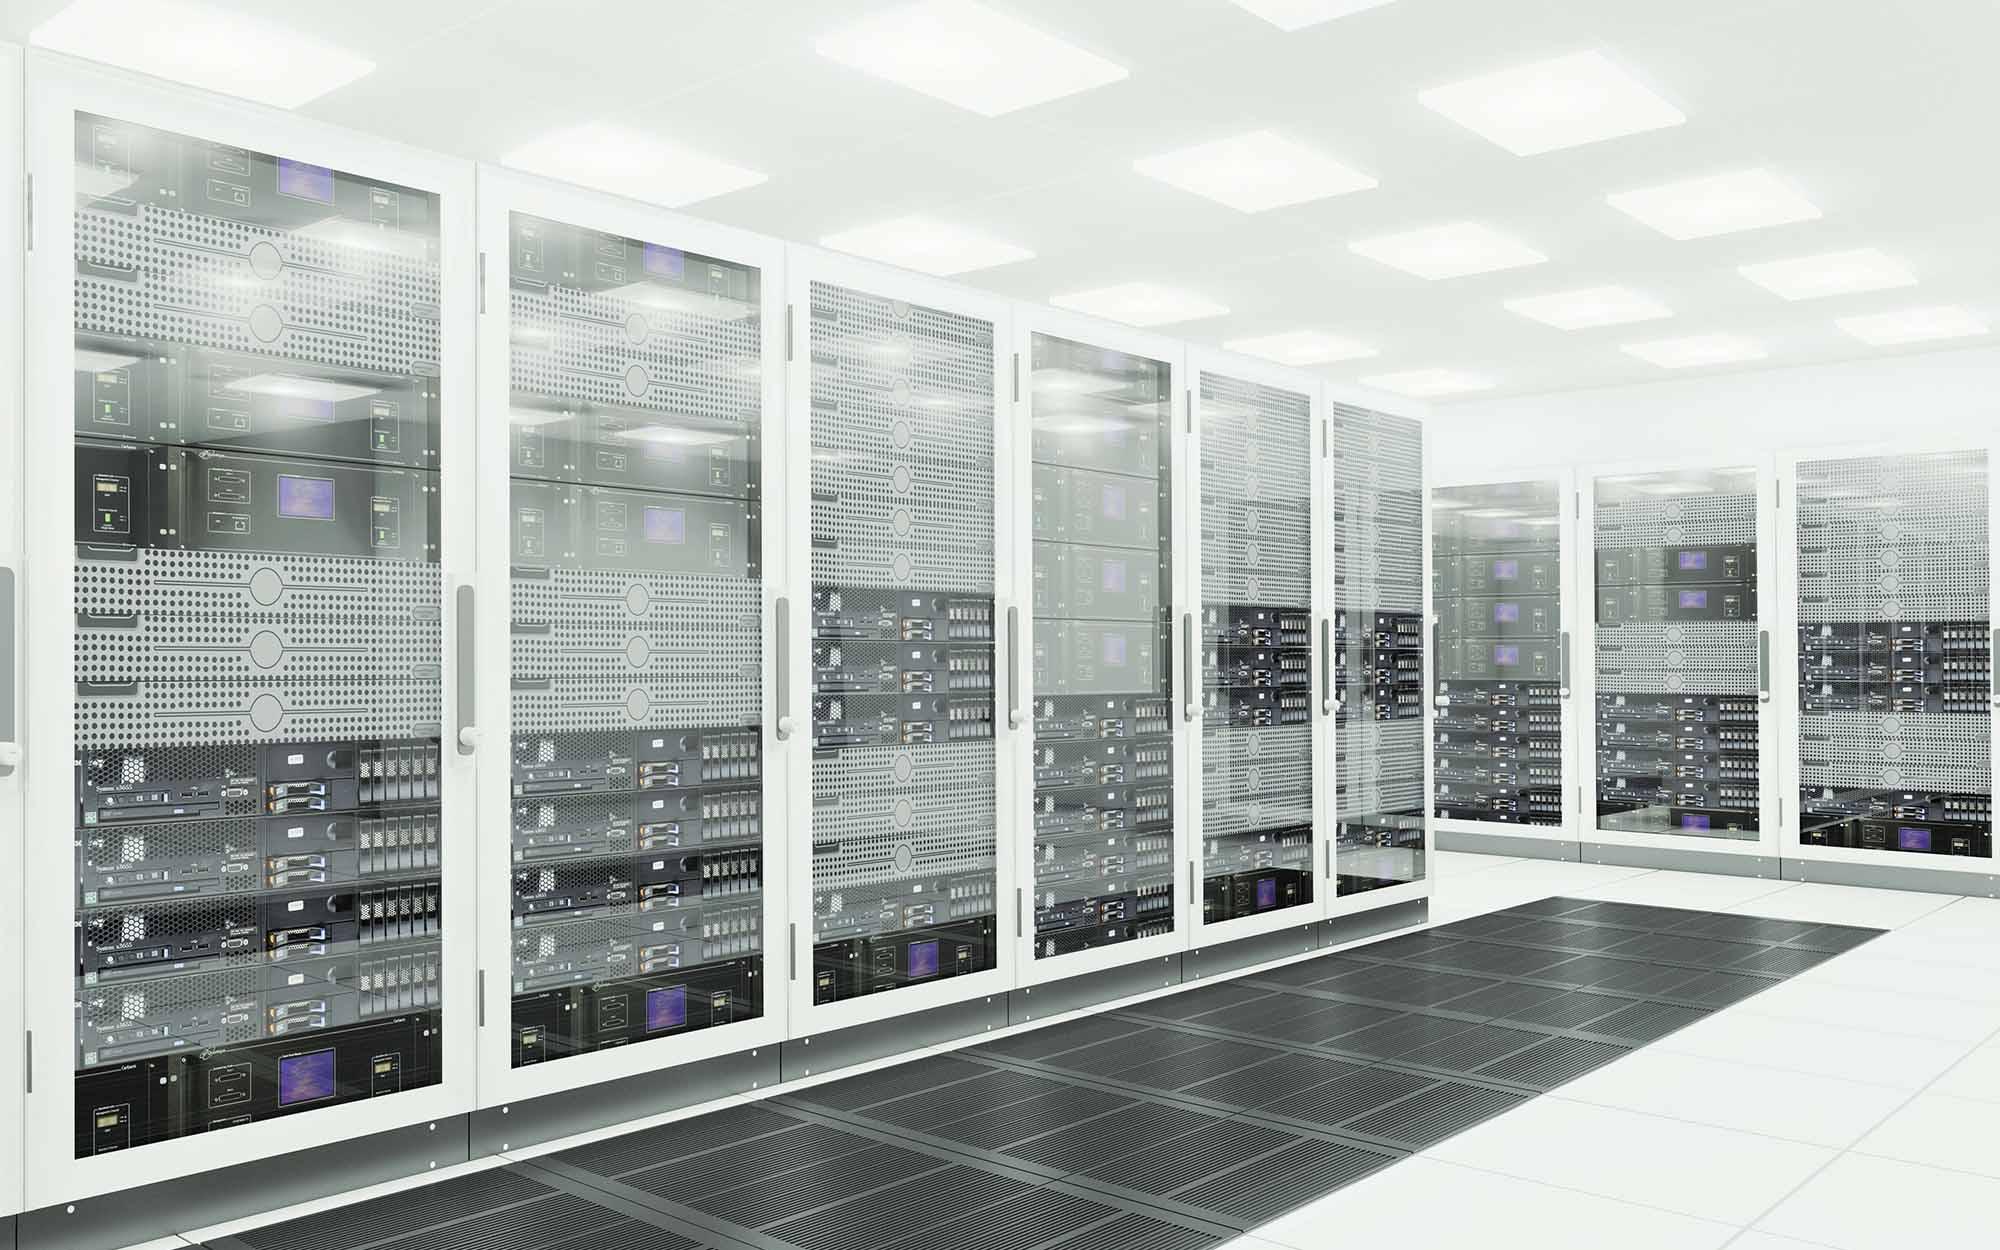 , Choosing the Right Cloud Platform